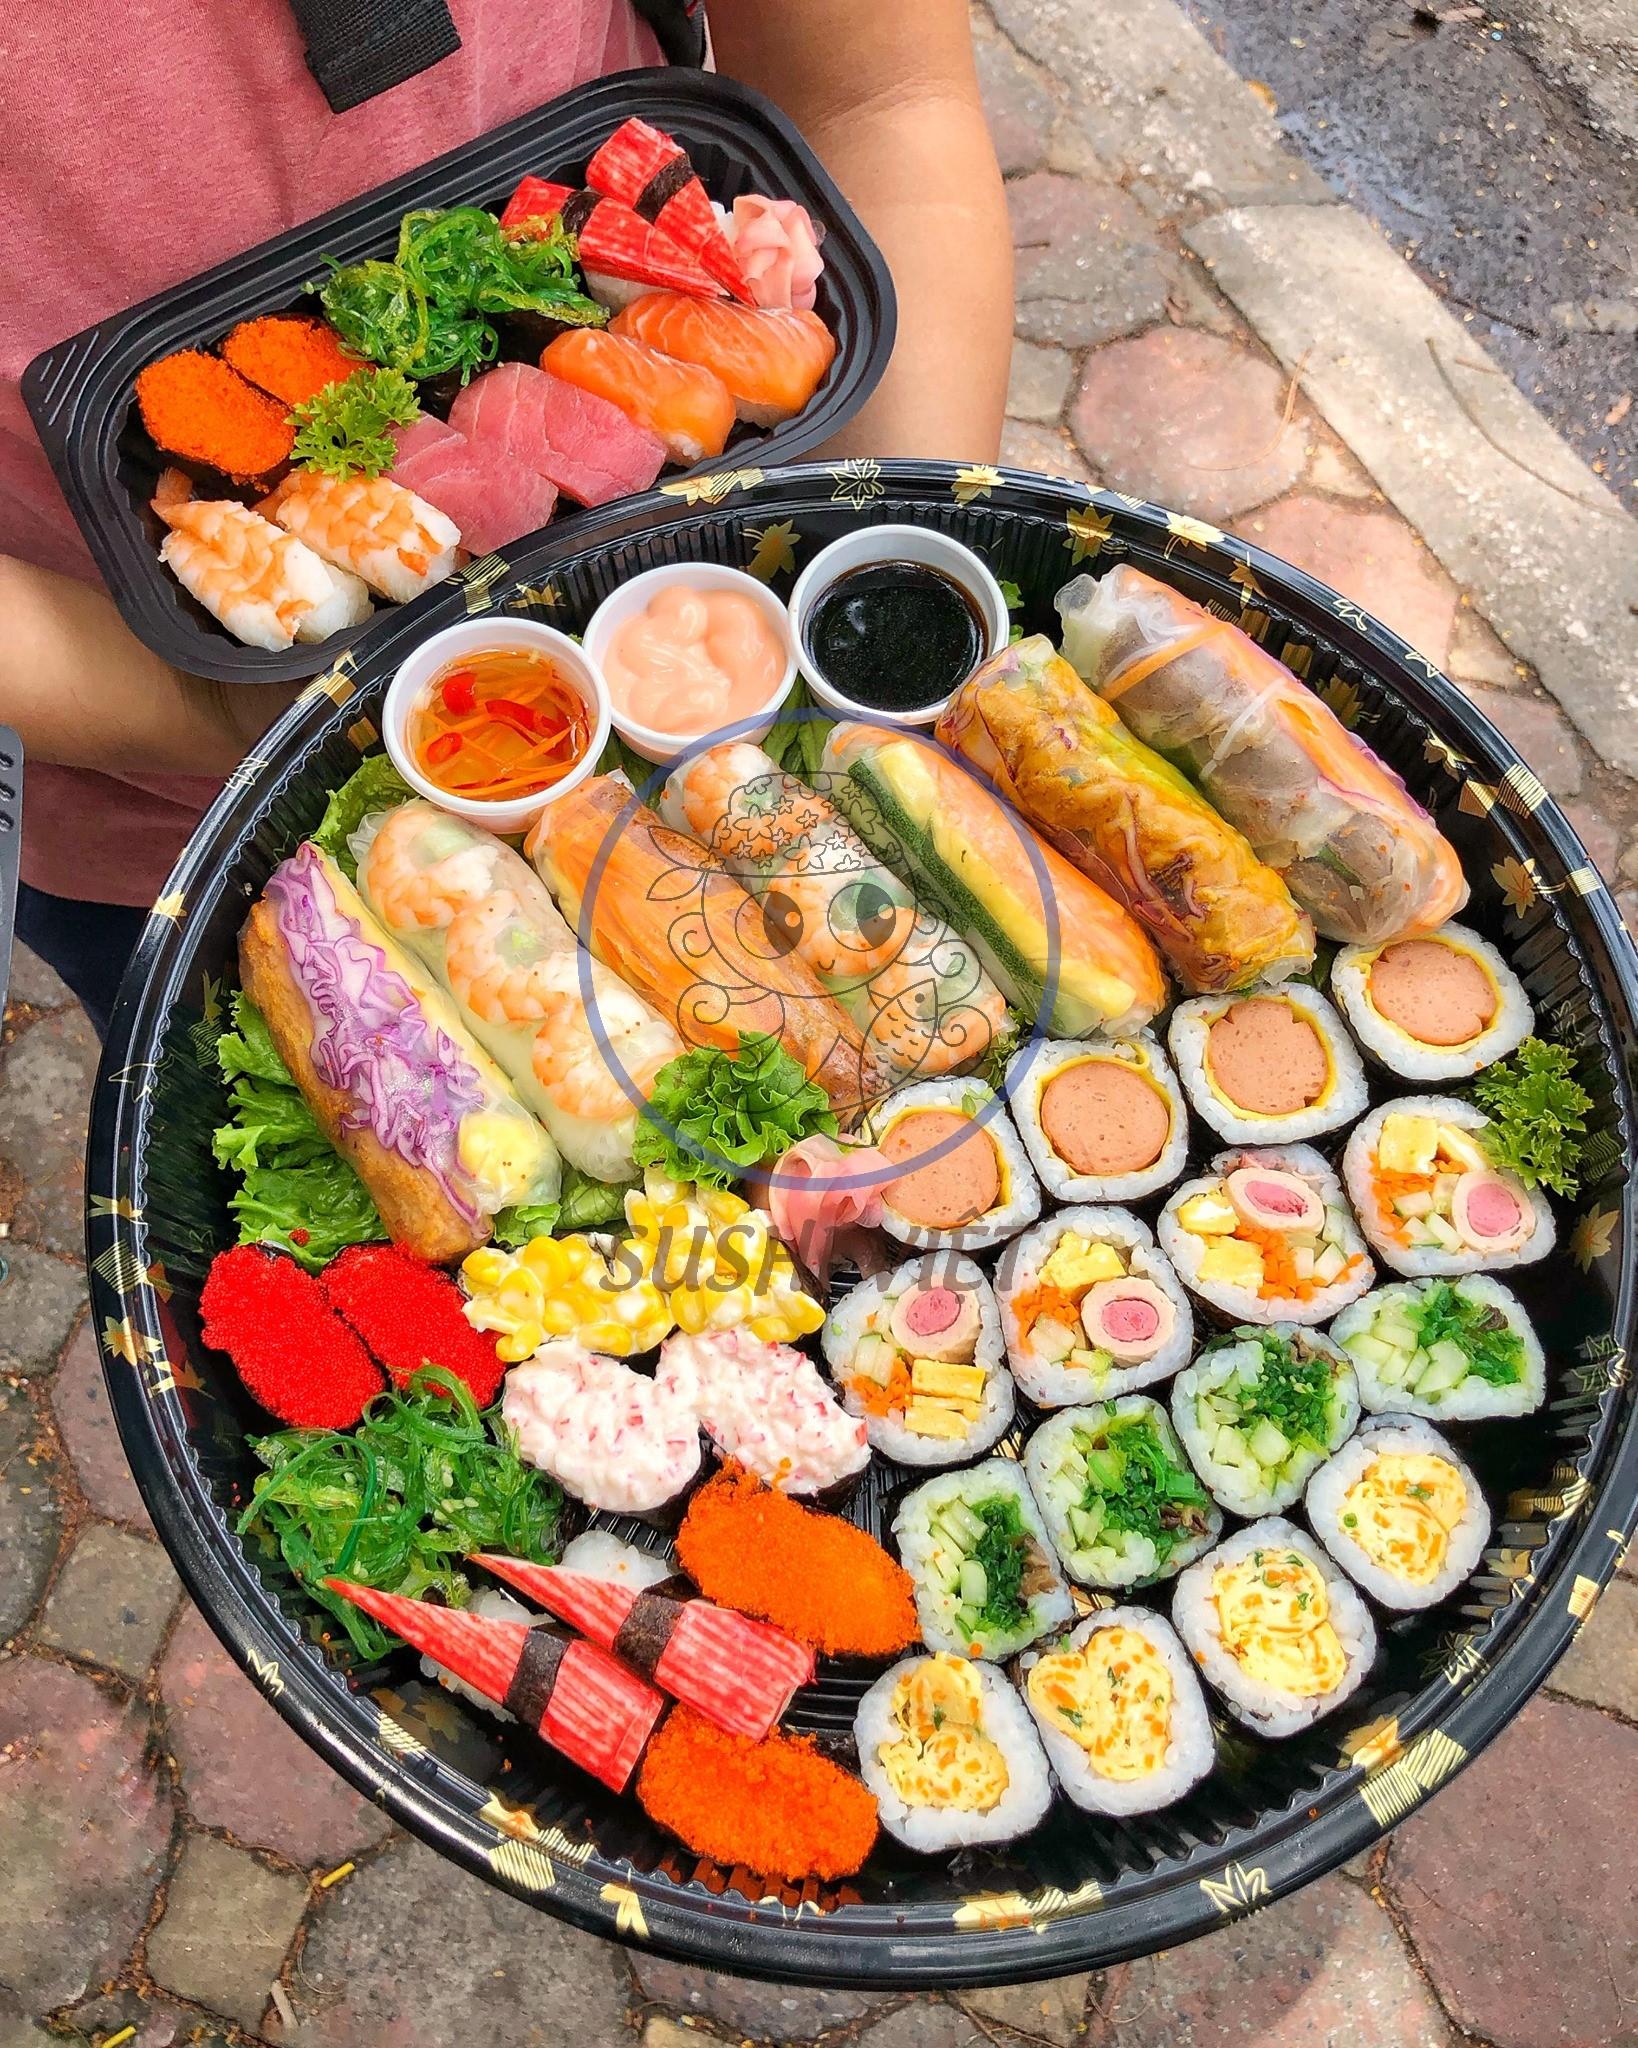 nha-hang-sushi-viet-hoang-quoc-viet